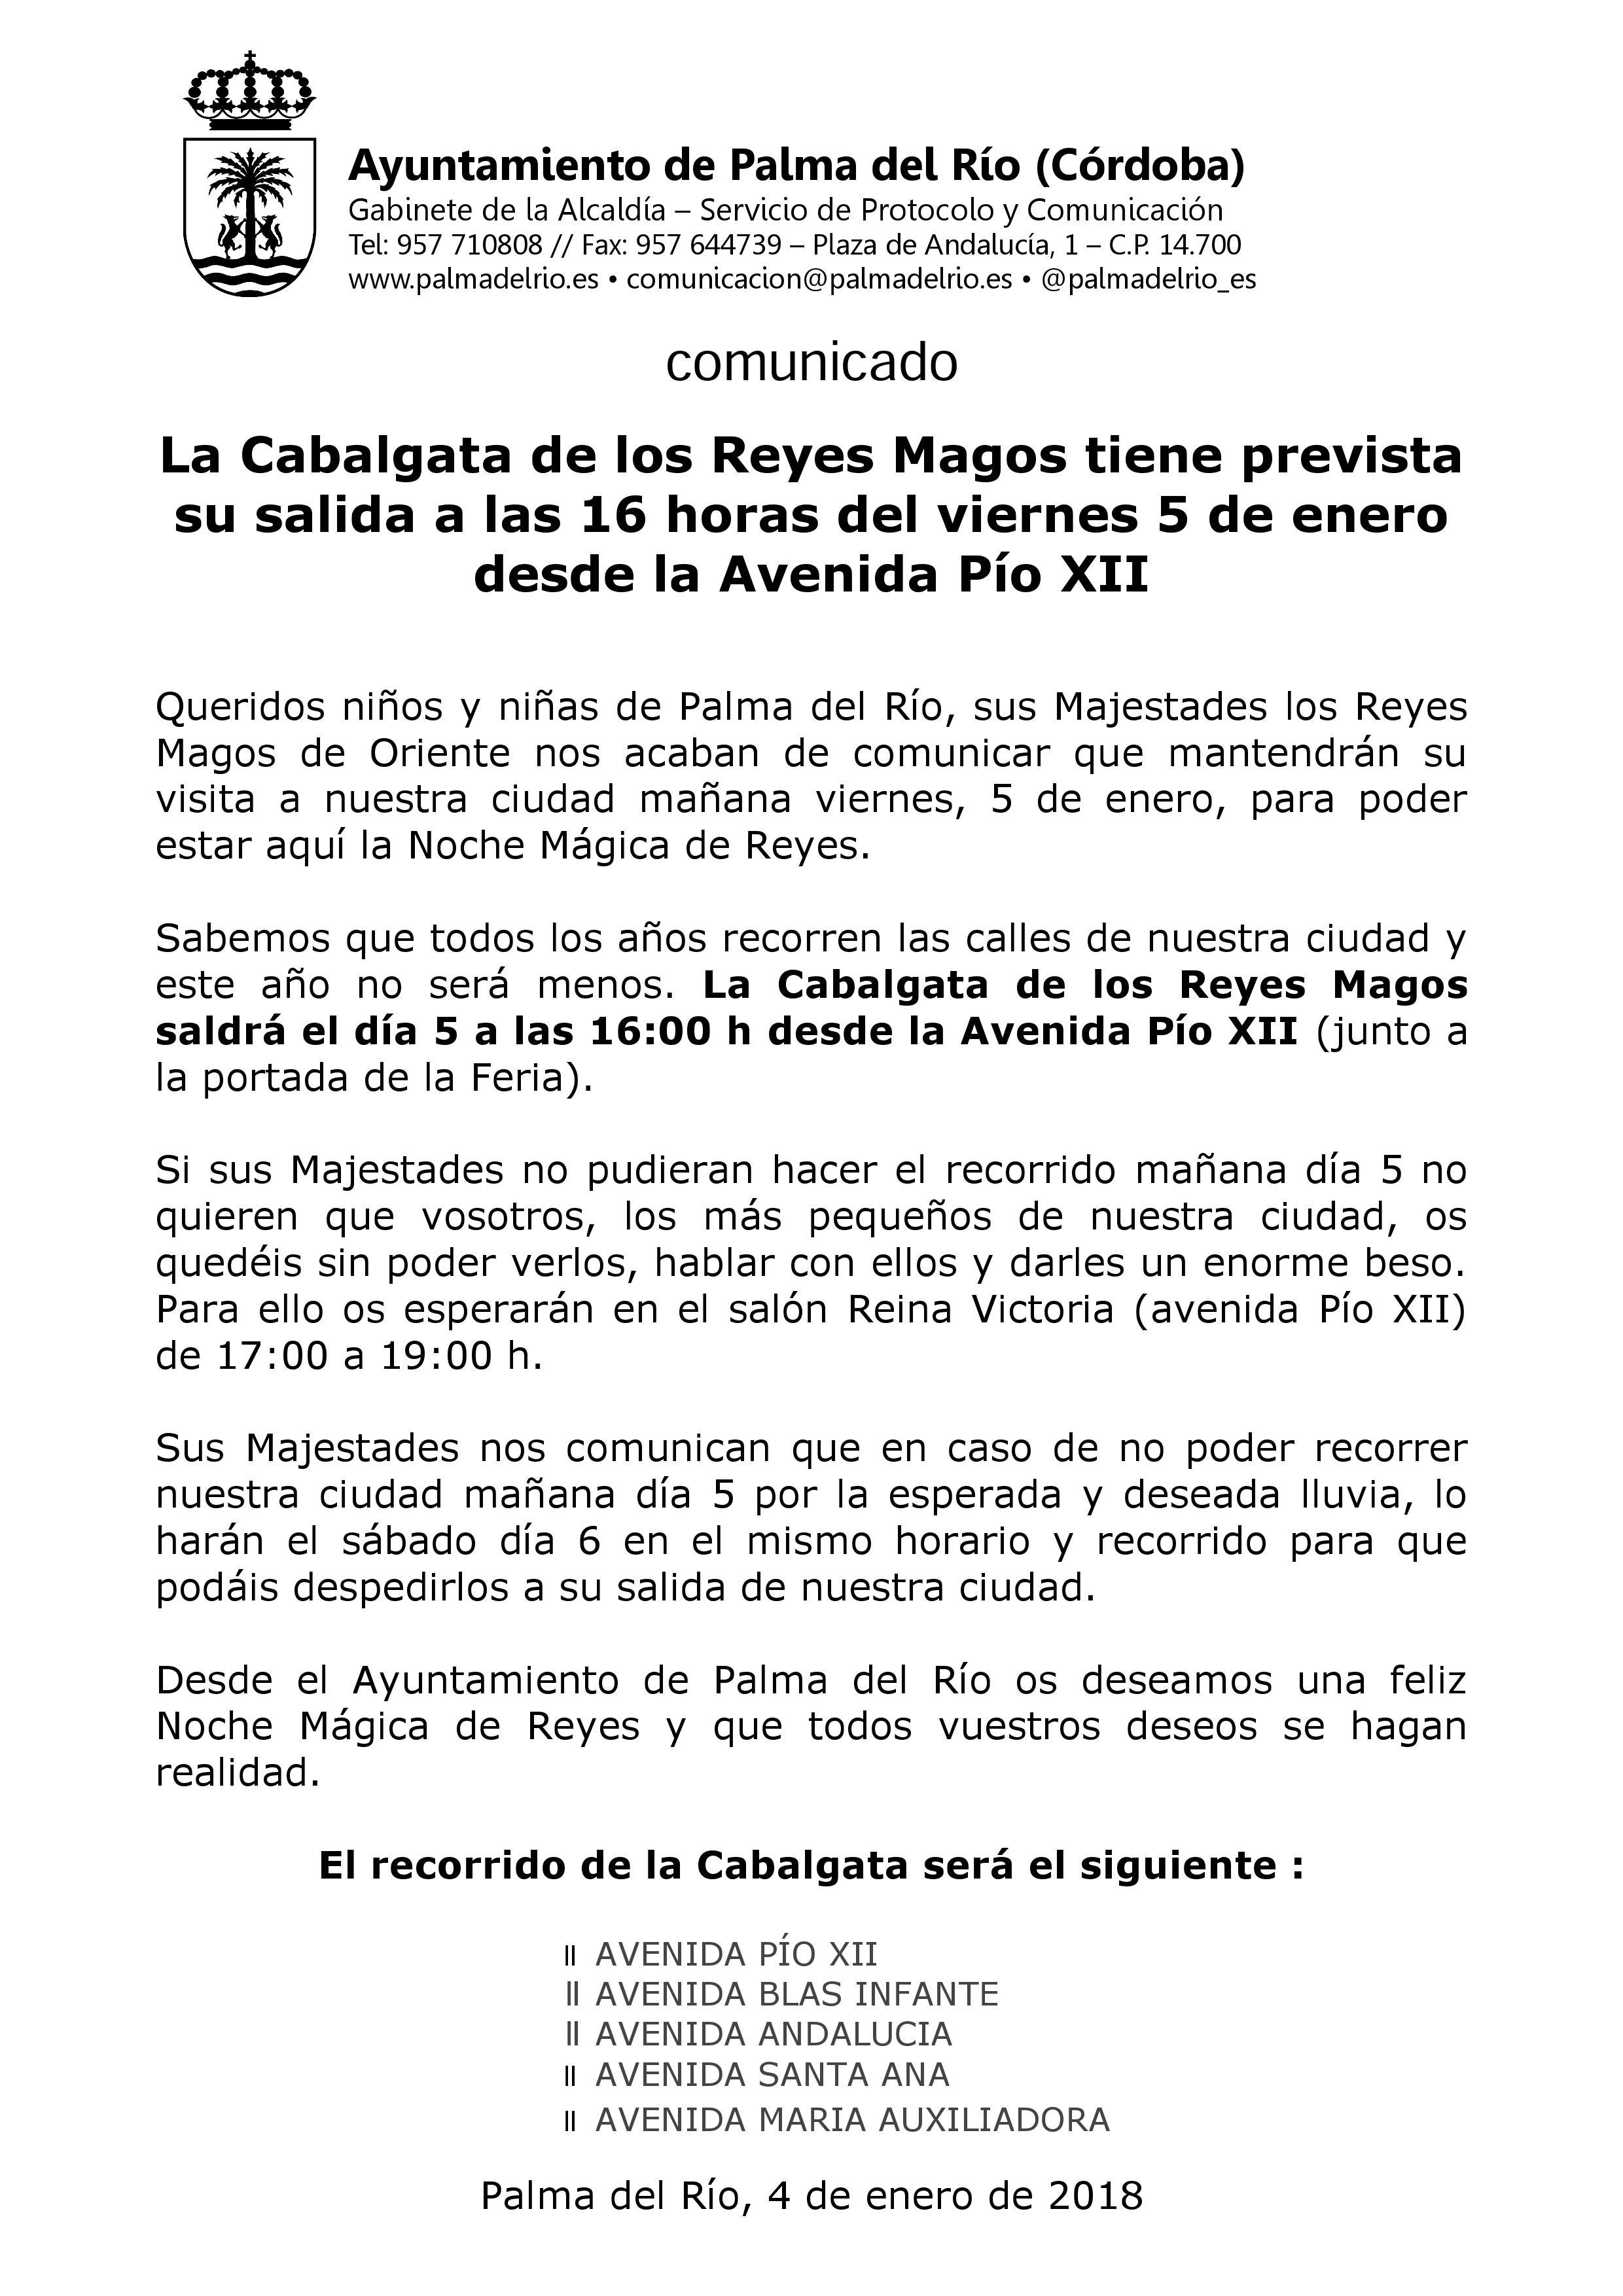 https://www.palmadelrio.es/sites/default/files/0001.jpg